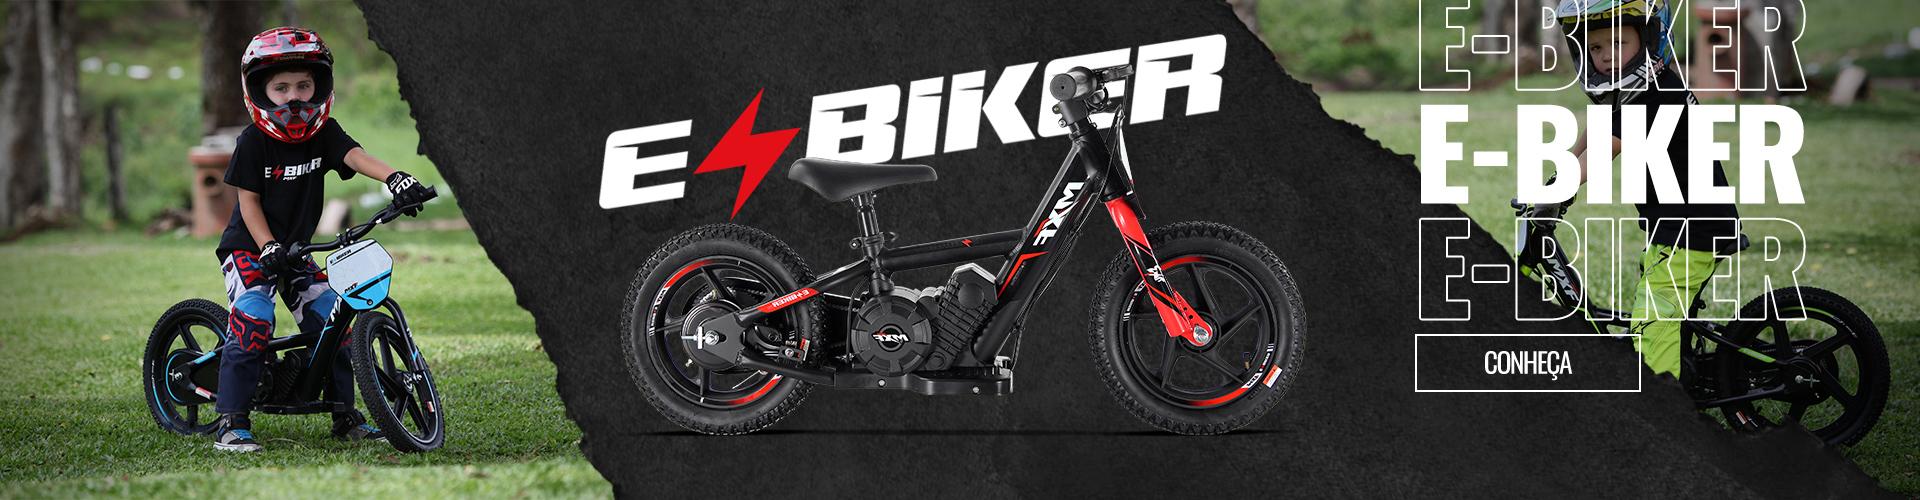 banner 4 - e-biker